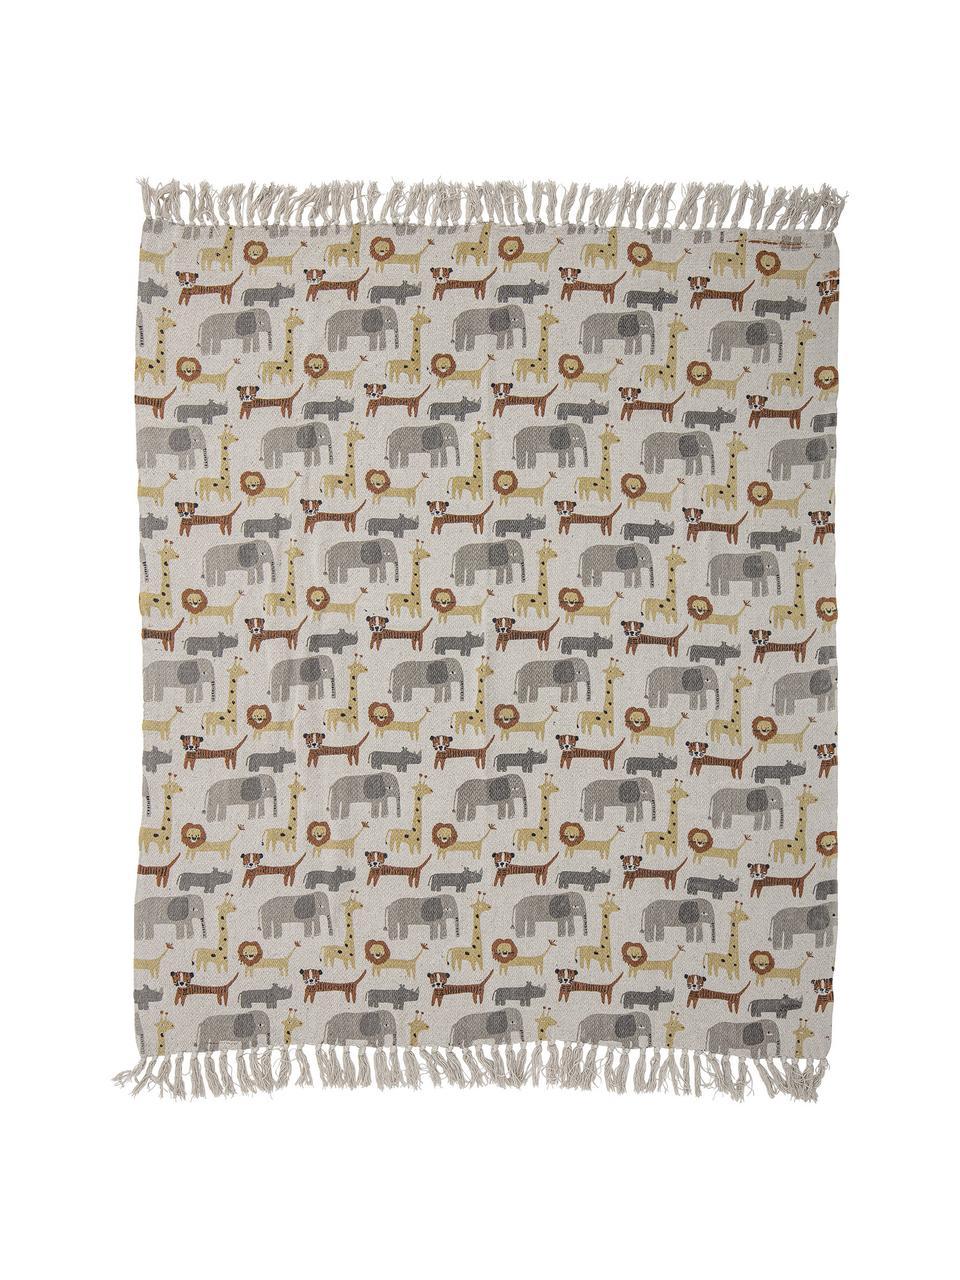 Baby-Plaid Brett mit Fransen, 52% recycelte Baumwolle, 32% Polyester, 10% Acryl, 6% Rayon, Braun, 80 x 100 cm